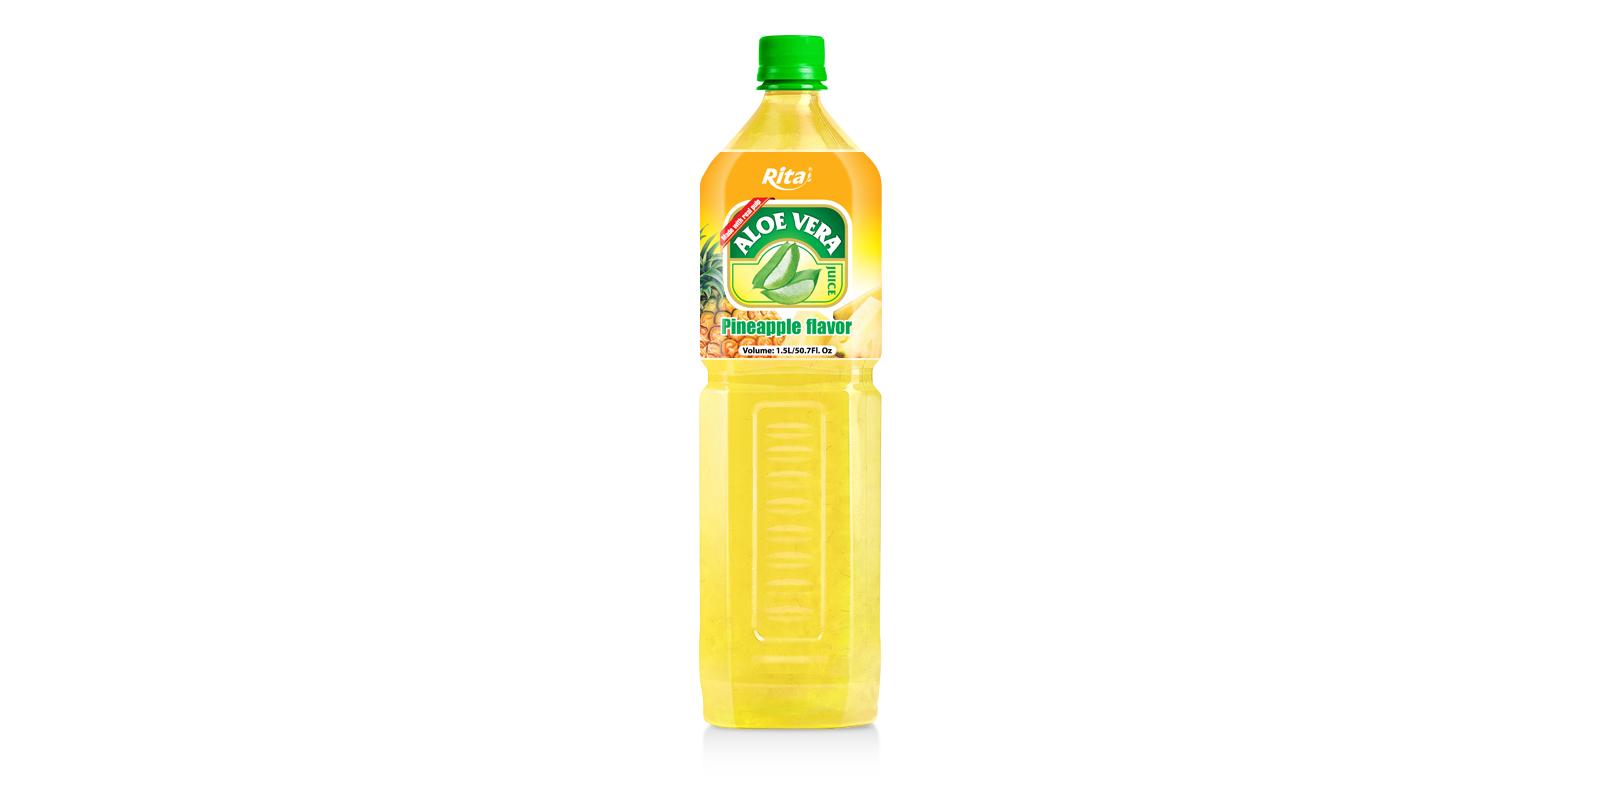 aloe vera products pineapple